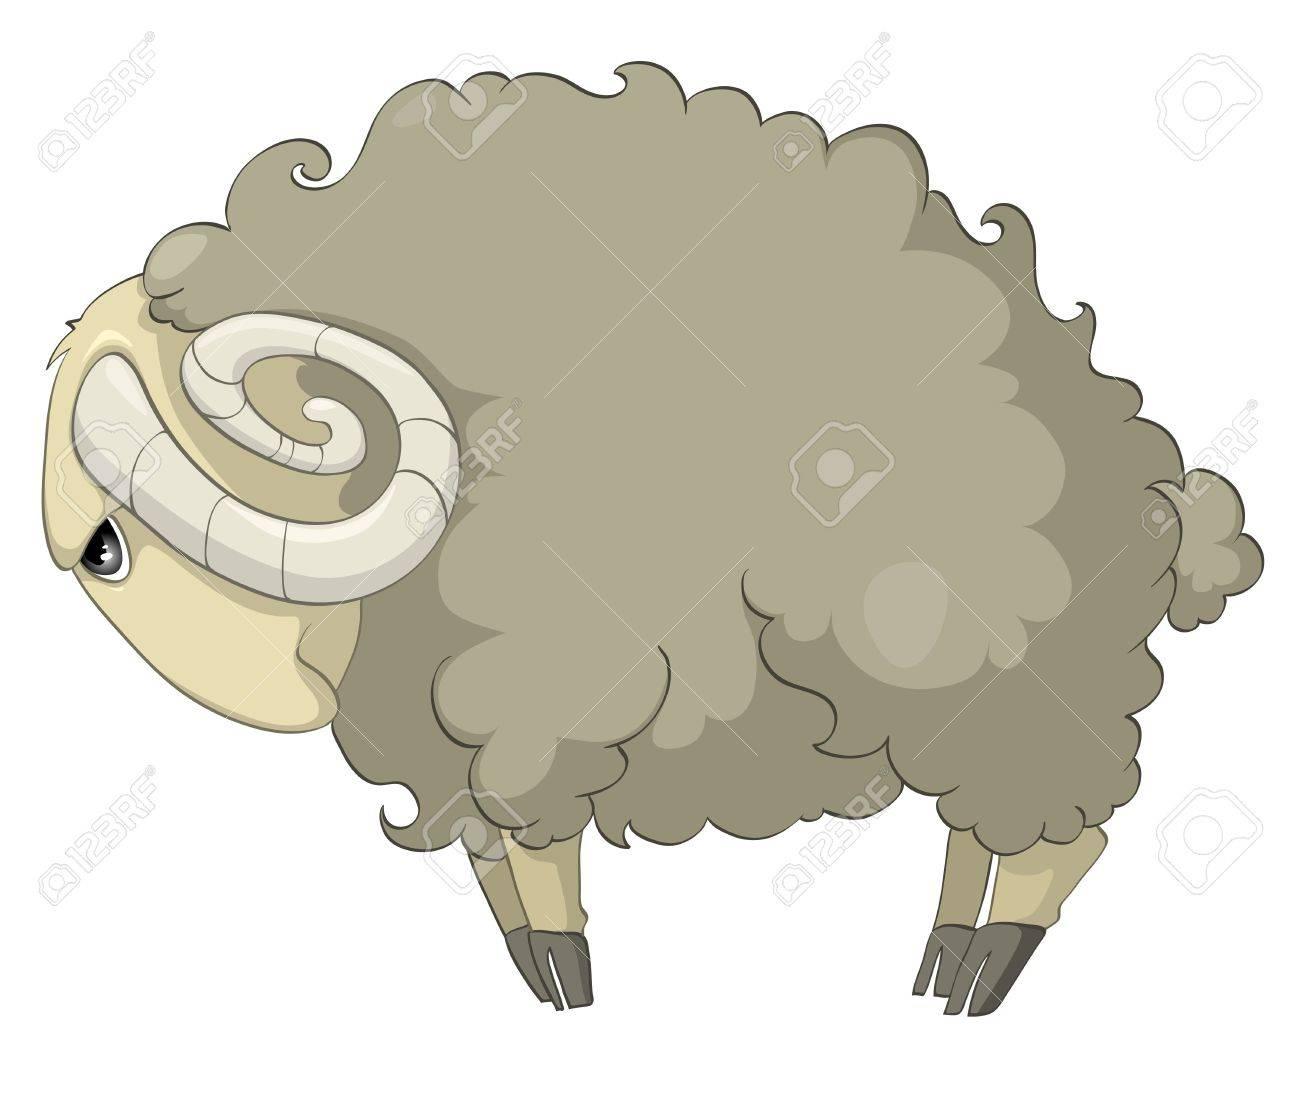 Cartoon Character Sheep Stock Vector - 10438977